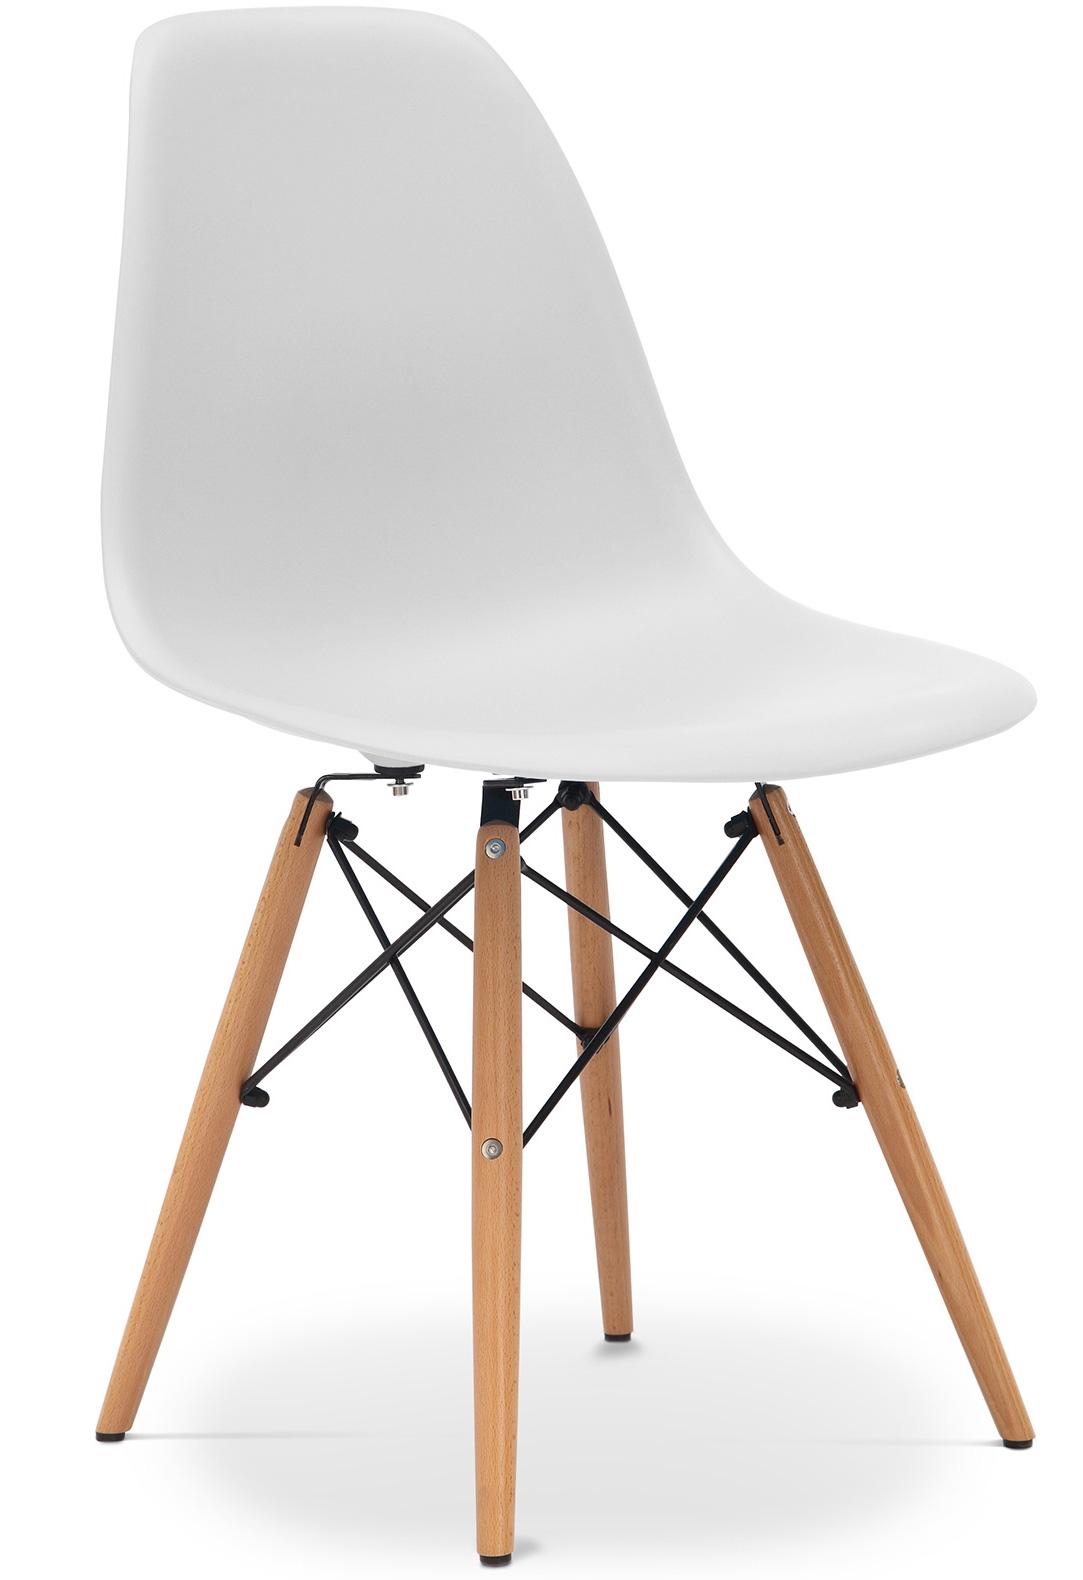 Chaise gris clair mat pieds h tre clair inspir e dsw for Pied chaise dsw